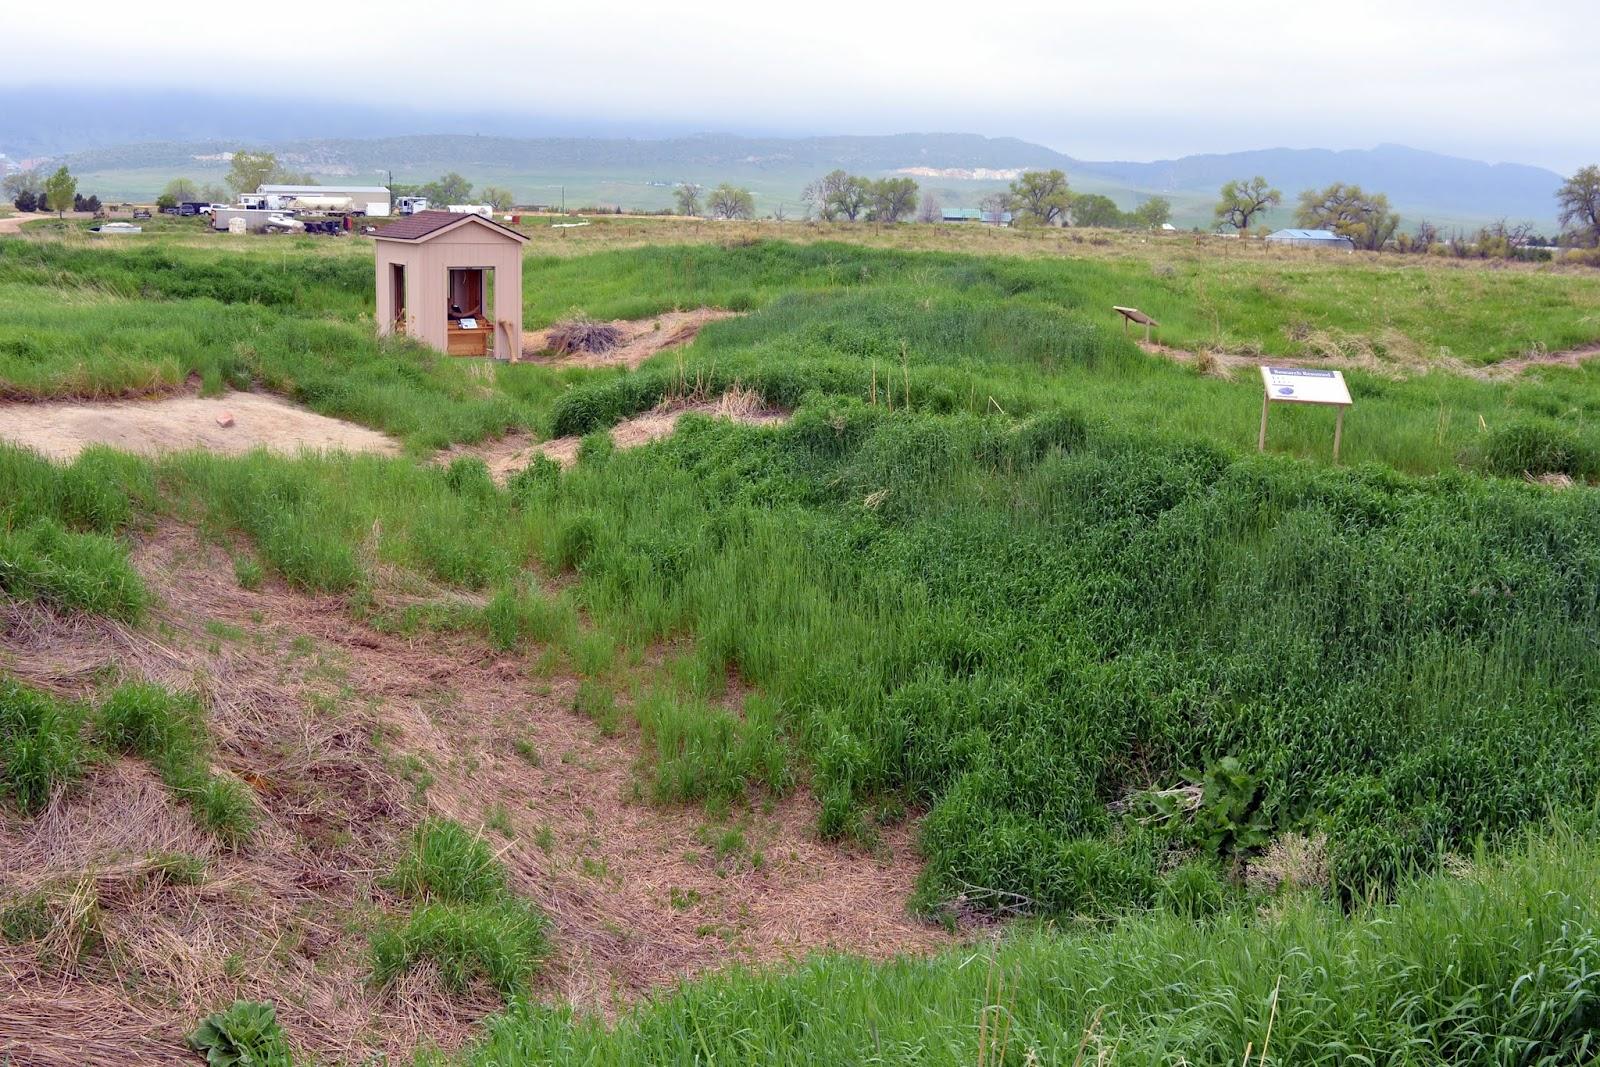 Mille Fiori Favoriti Lamb Springs Where The Mammoths Roamed